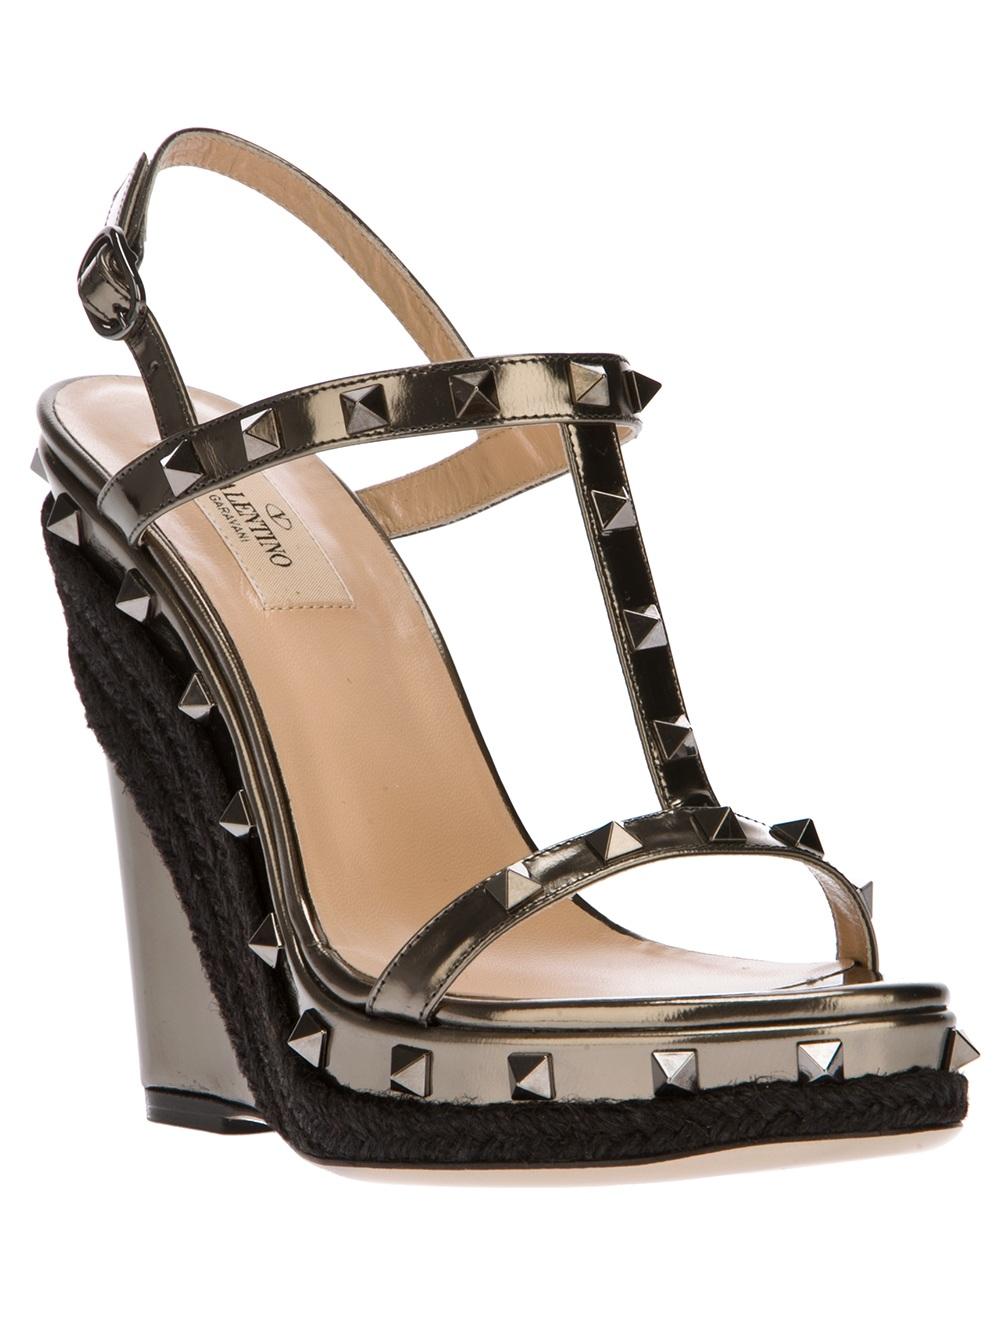 a5123d7bcdb3 Lyst - Valentino Rockstud Wedge Sandal in Brown